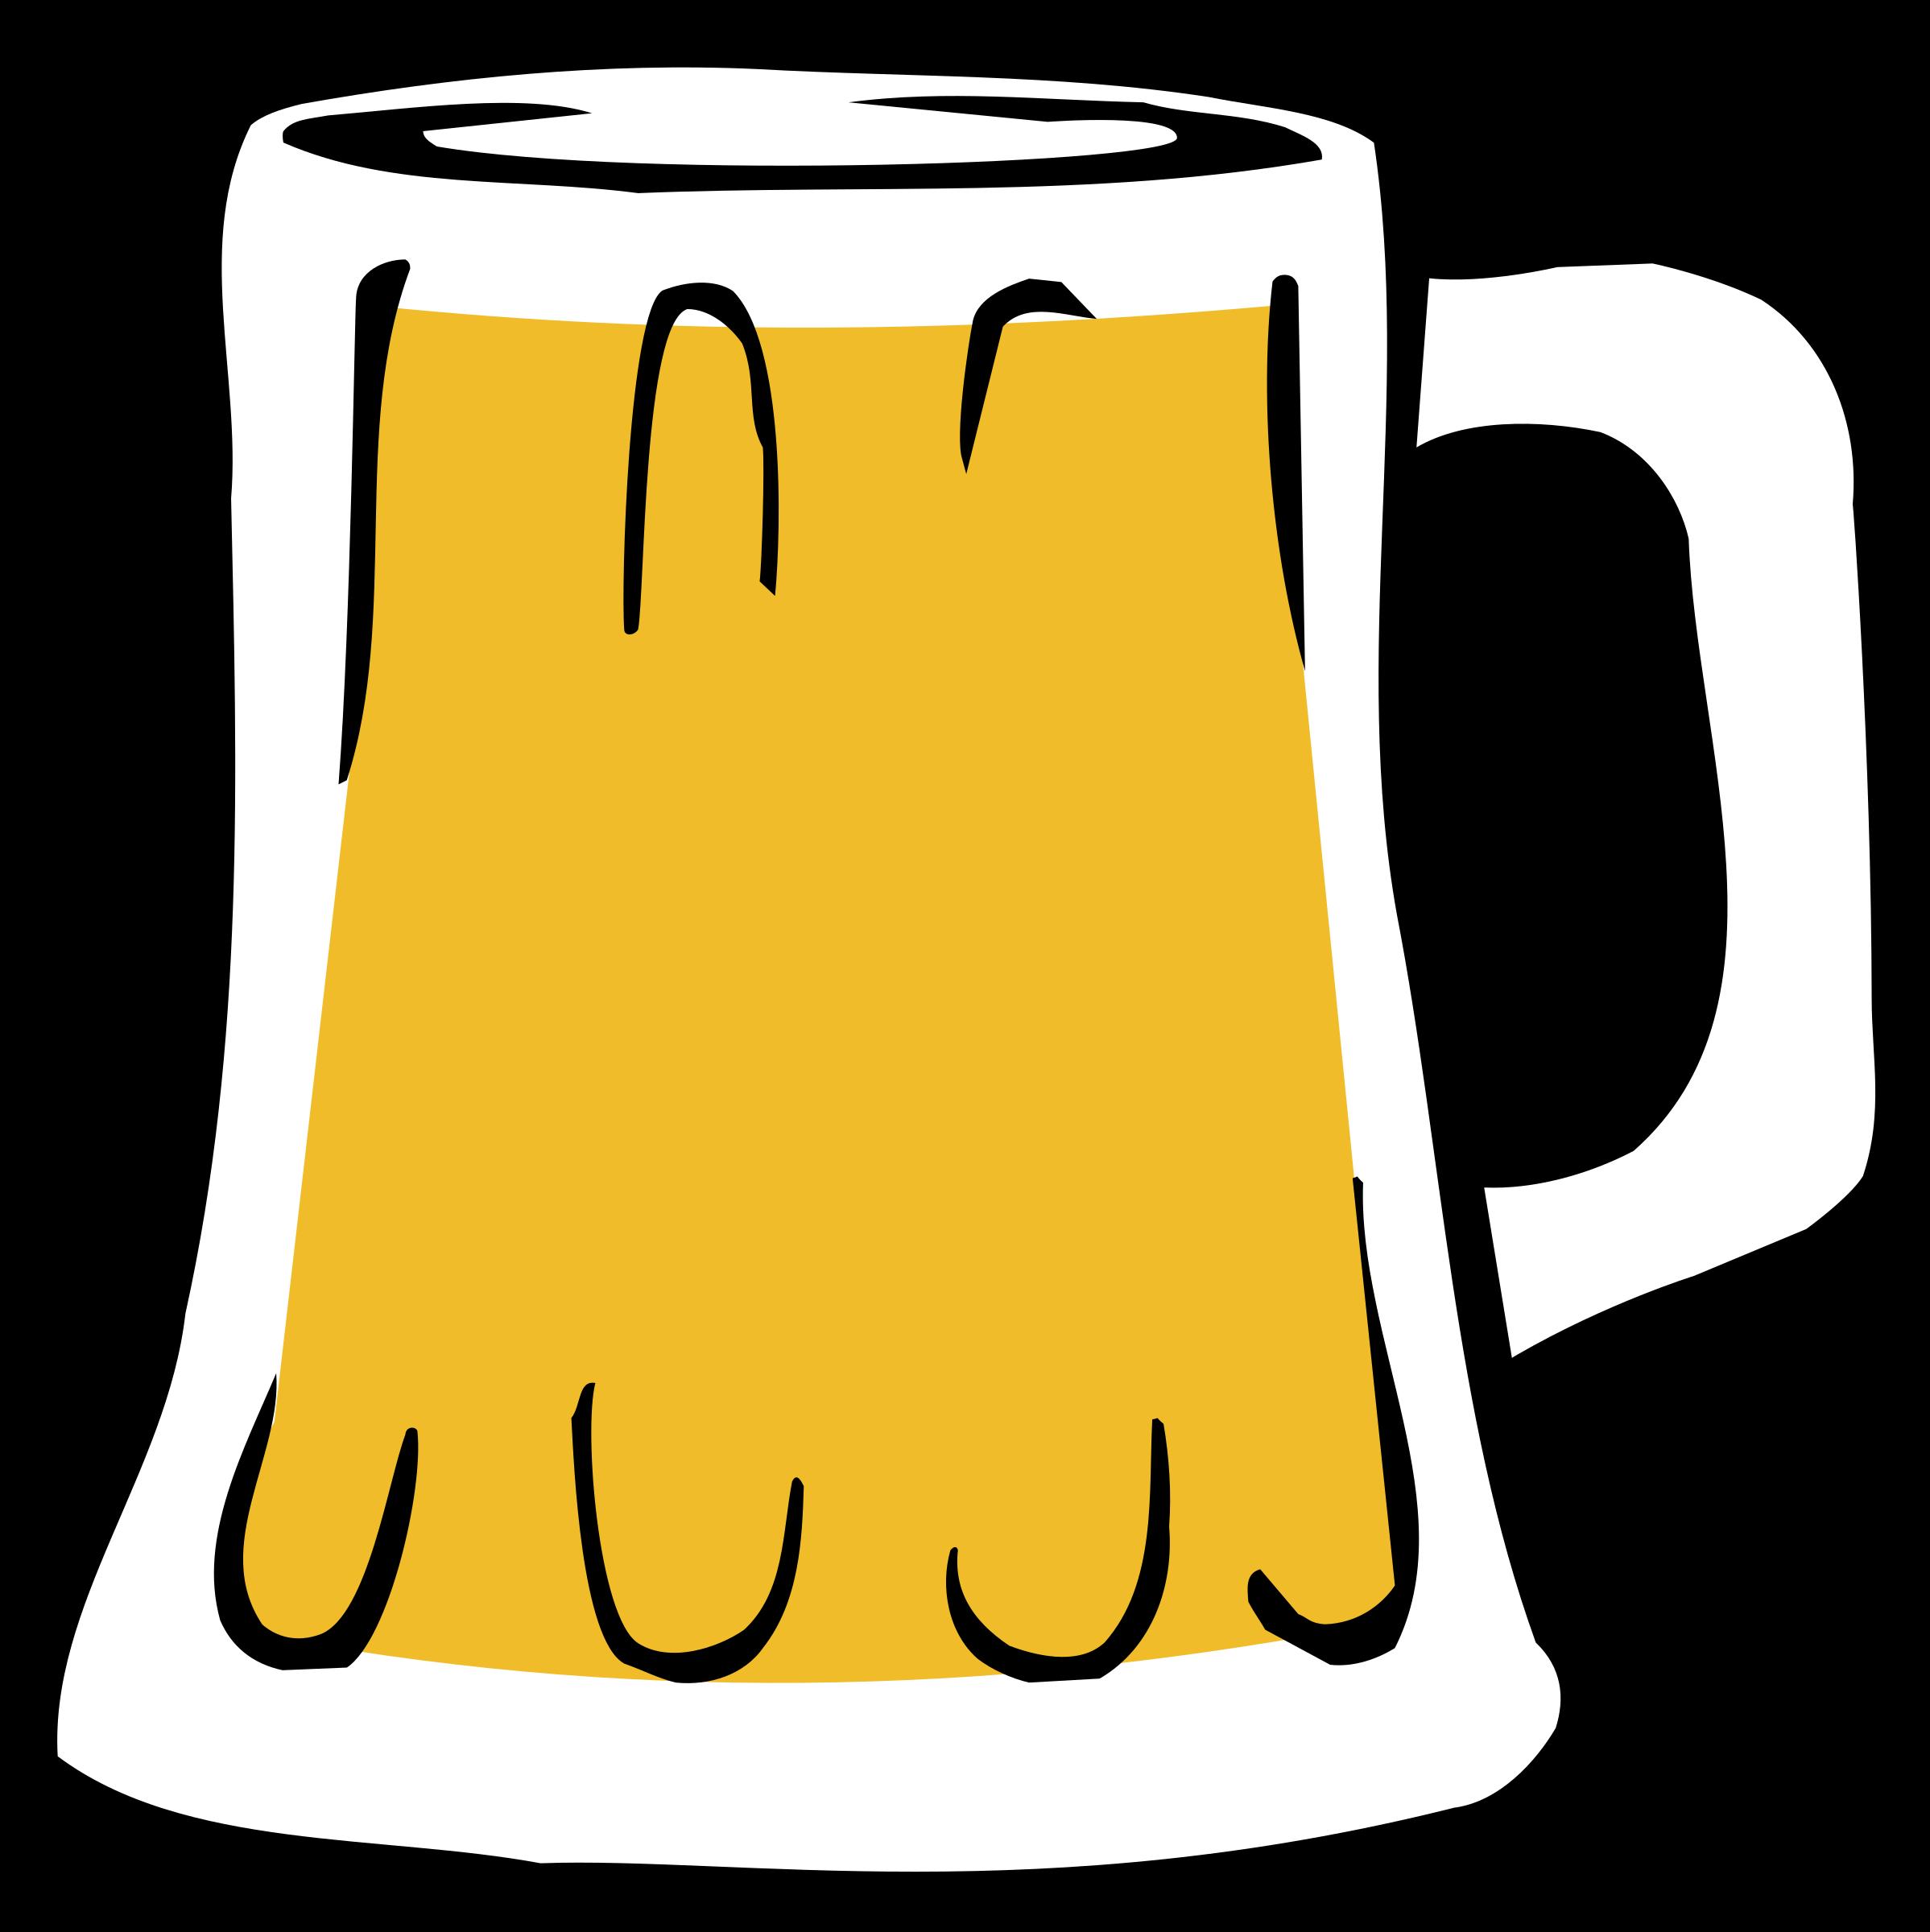 related beer bottle logo beer logo vintage beer mug logo beer ...